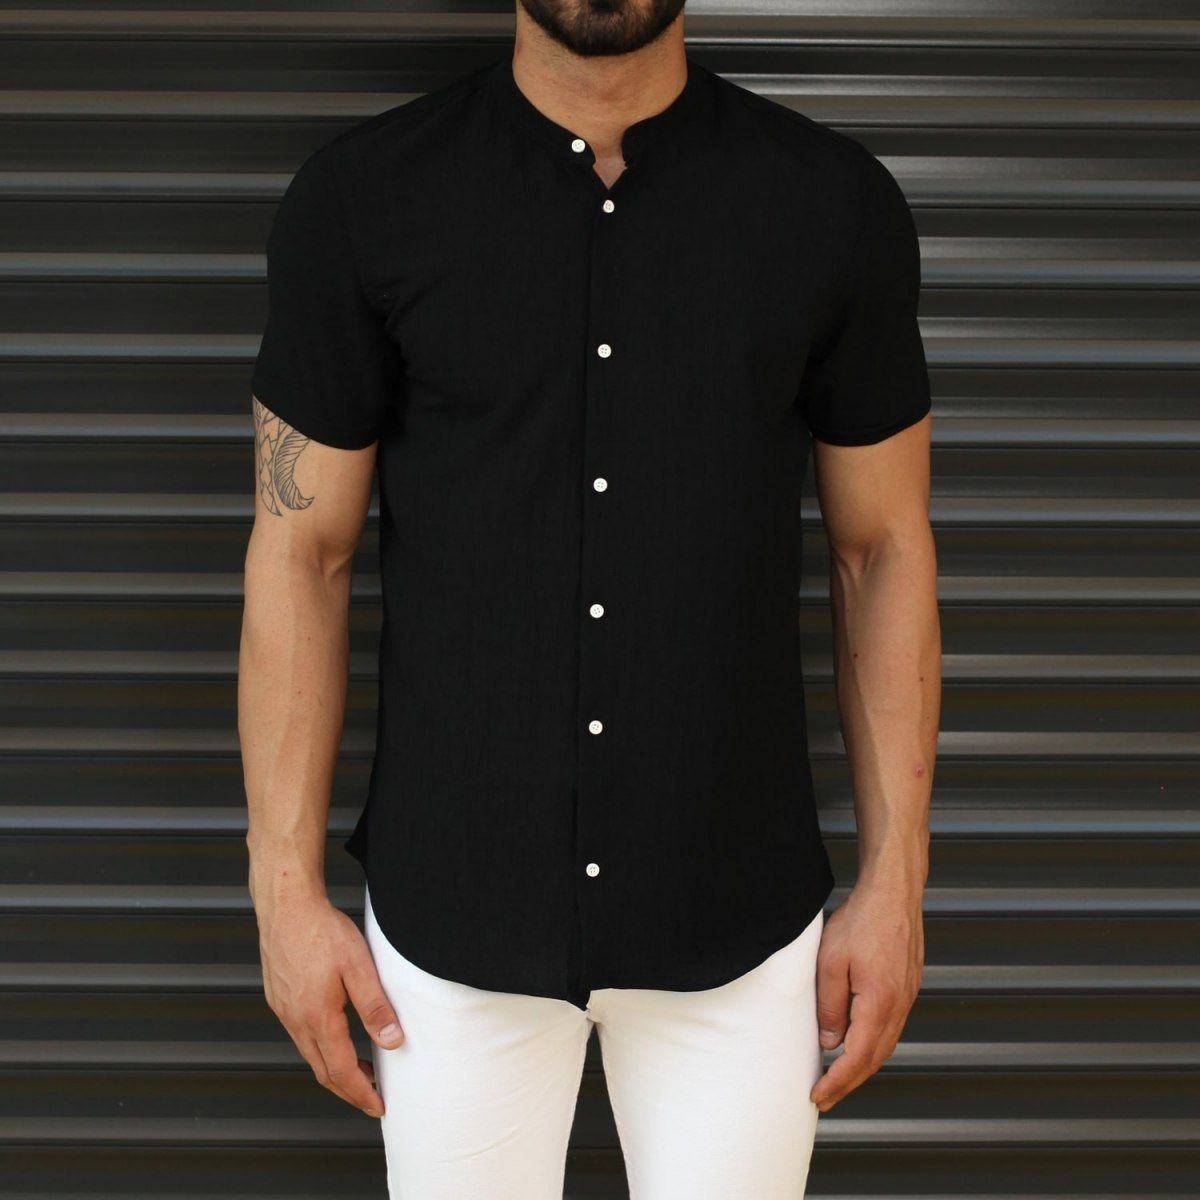 Men's Short Sleeve Grandad Collar Shirt In Black Mv Premium Brand - 1